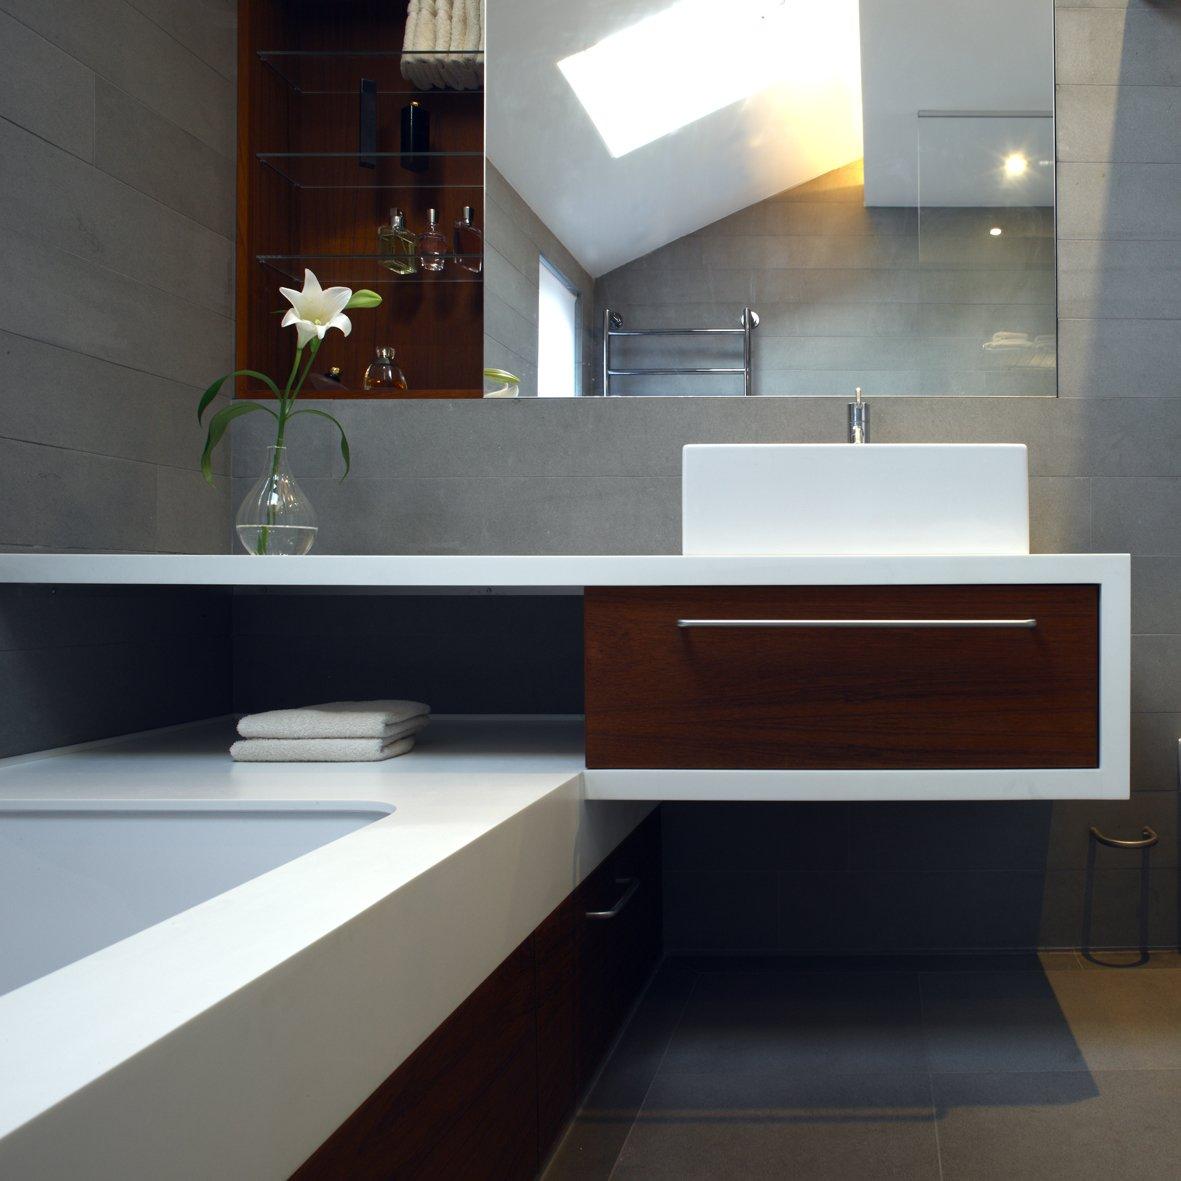 Bath Room, Vessel Sink, Quartzite Counter, Concrete Floor, and Undermount Tub  Elm Grove by Thompson + Baroni